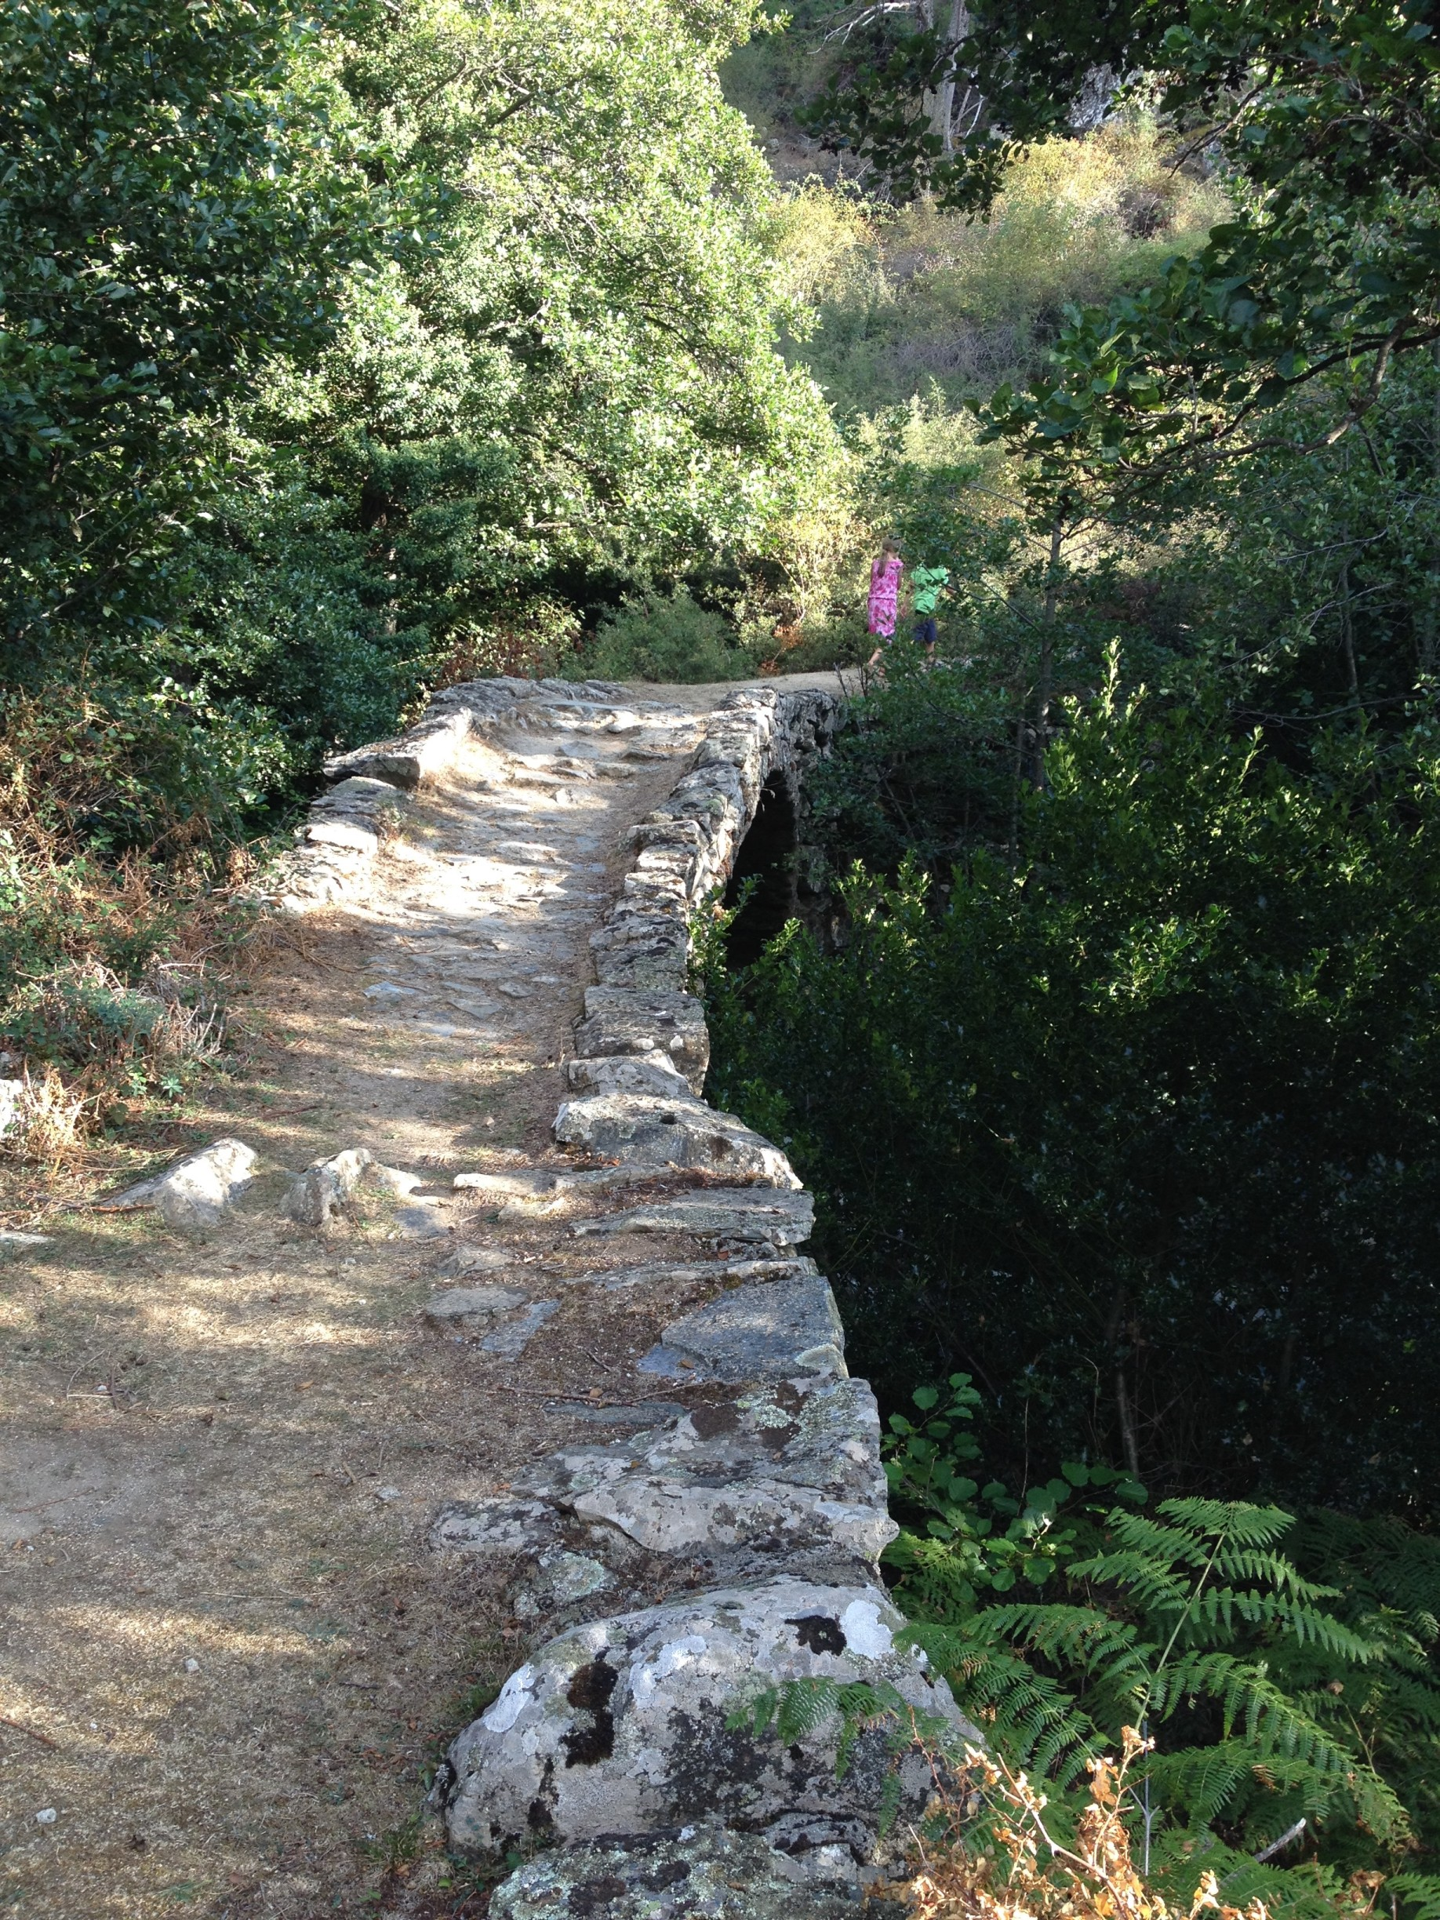 Lozzi: Gumpen bei der alten Brücke